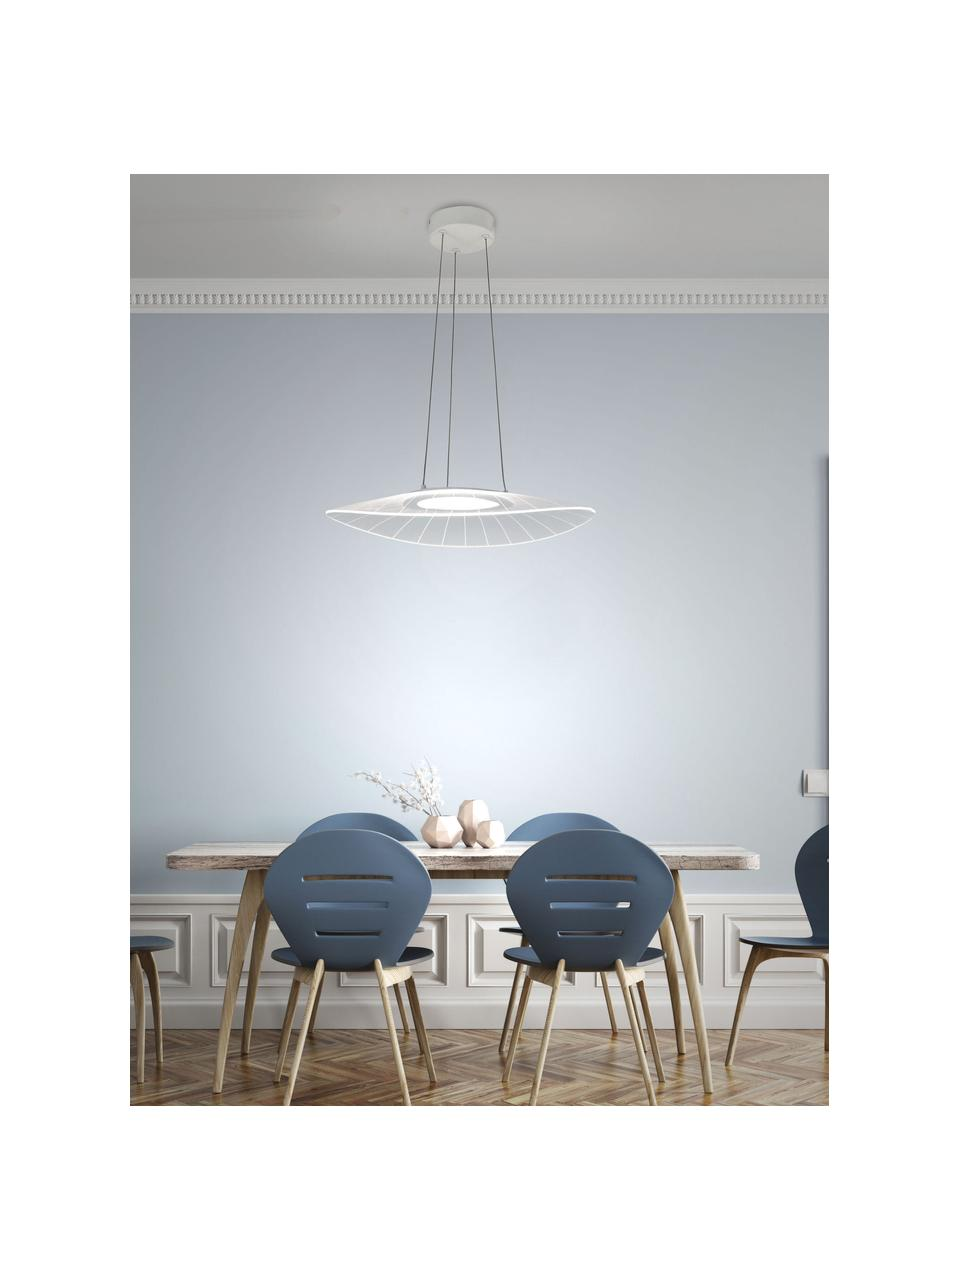 Lampada a sospensione a LED Vela, Paralume: metallo metacrilato Balda, Bianco, Larg. 59 x Prof. 43 cm